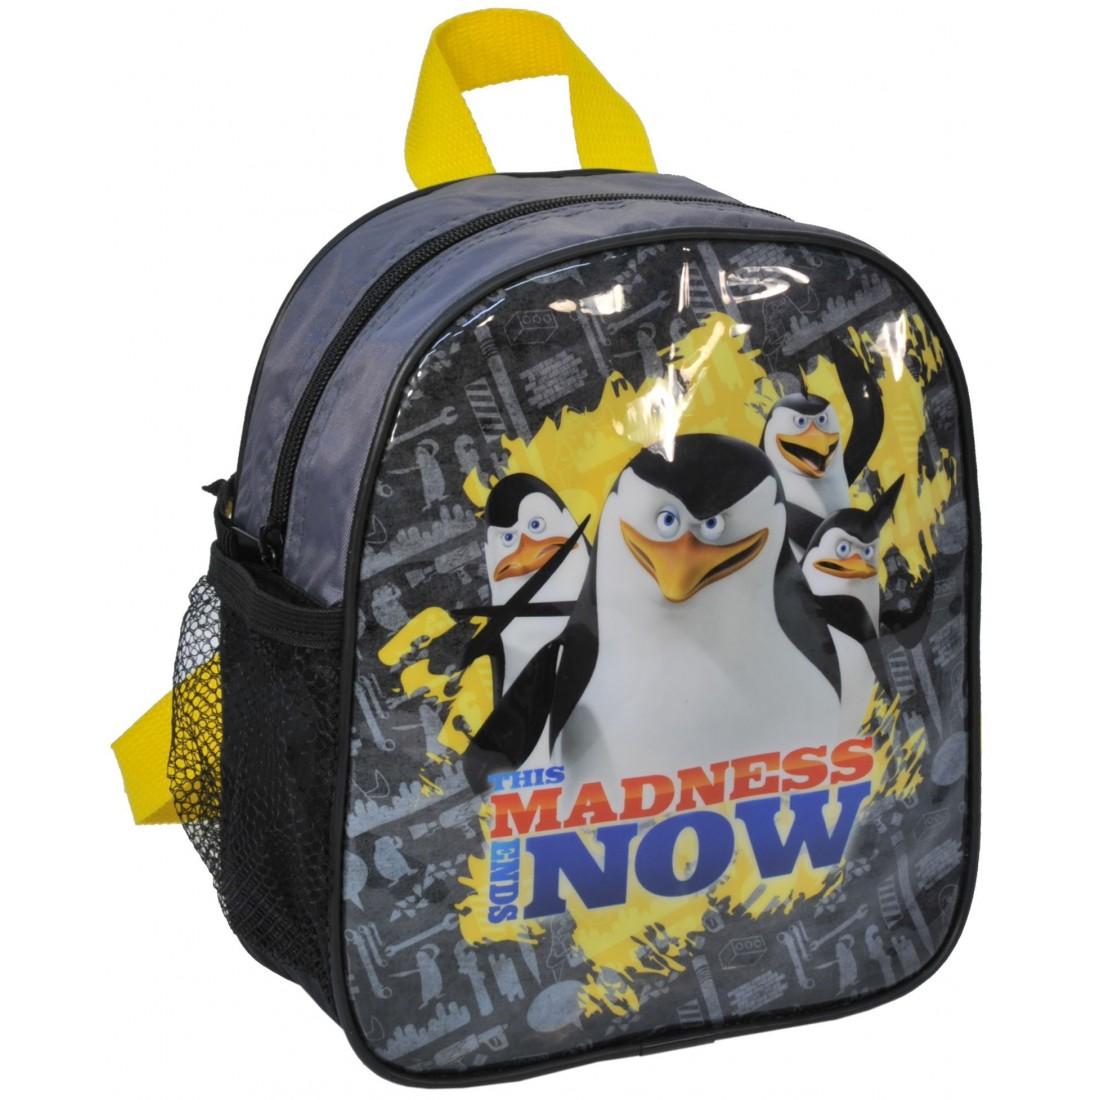 Plecaczek Pingwiny z Madagaskaru - plecak-tornister.pl